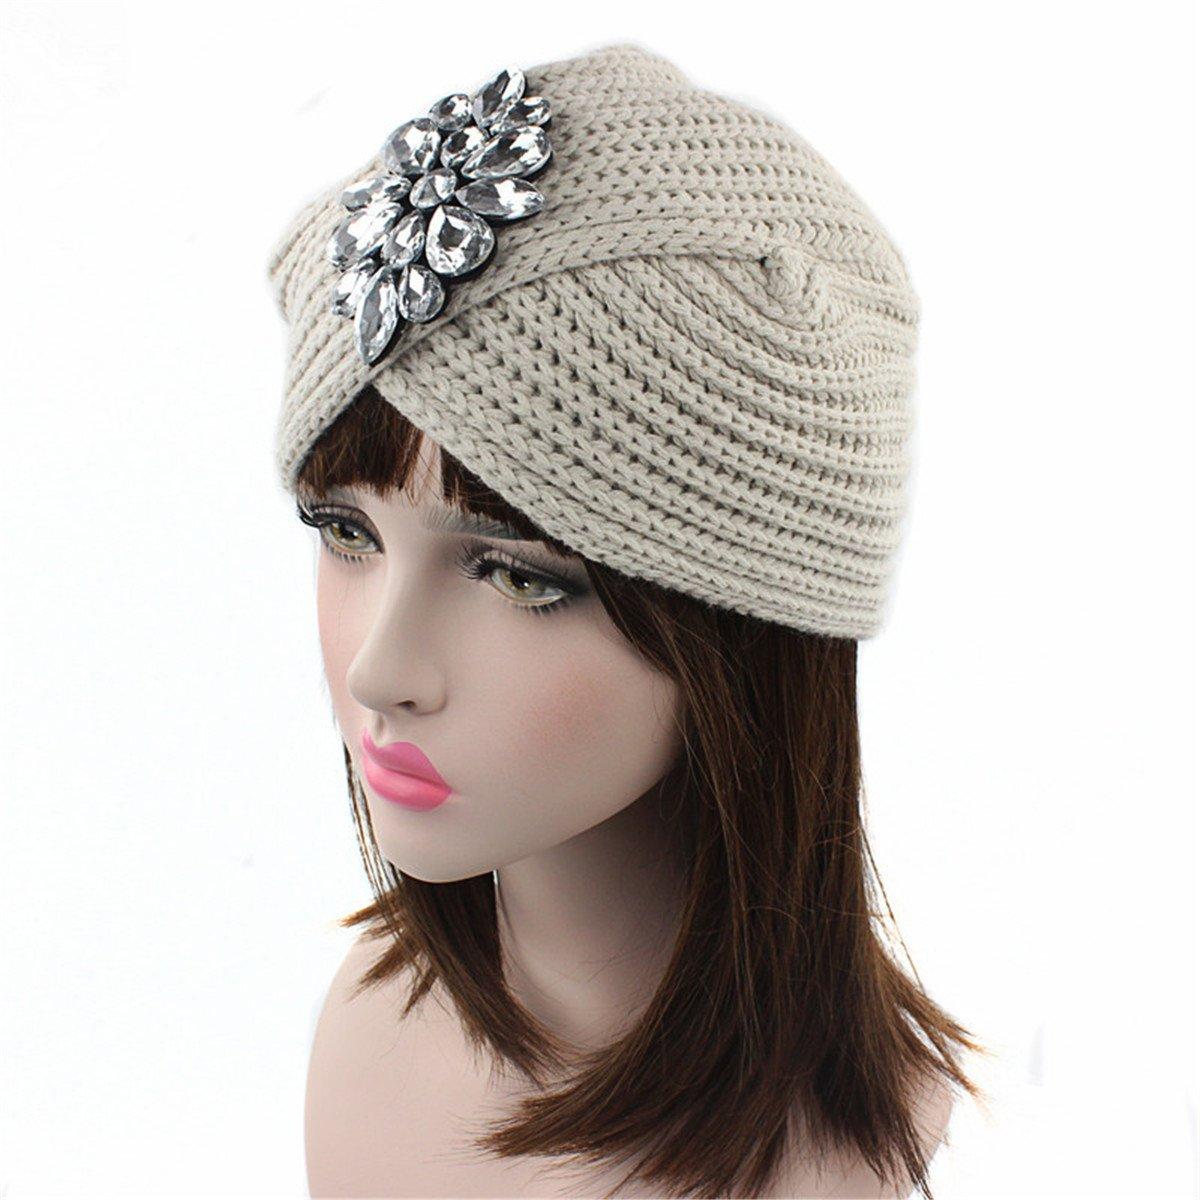 Amazon.com: Qhome Womens Luxury Divas Winter Knit Turban Beanie With Jeweled Pendant: Clothing